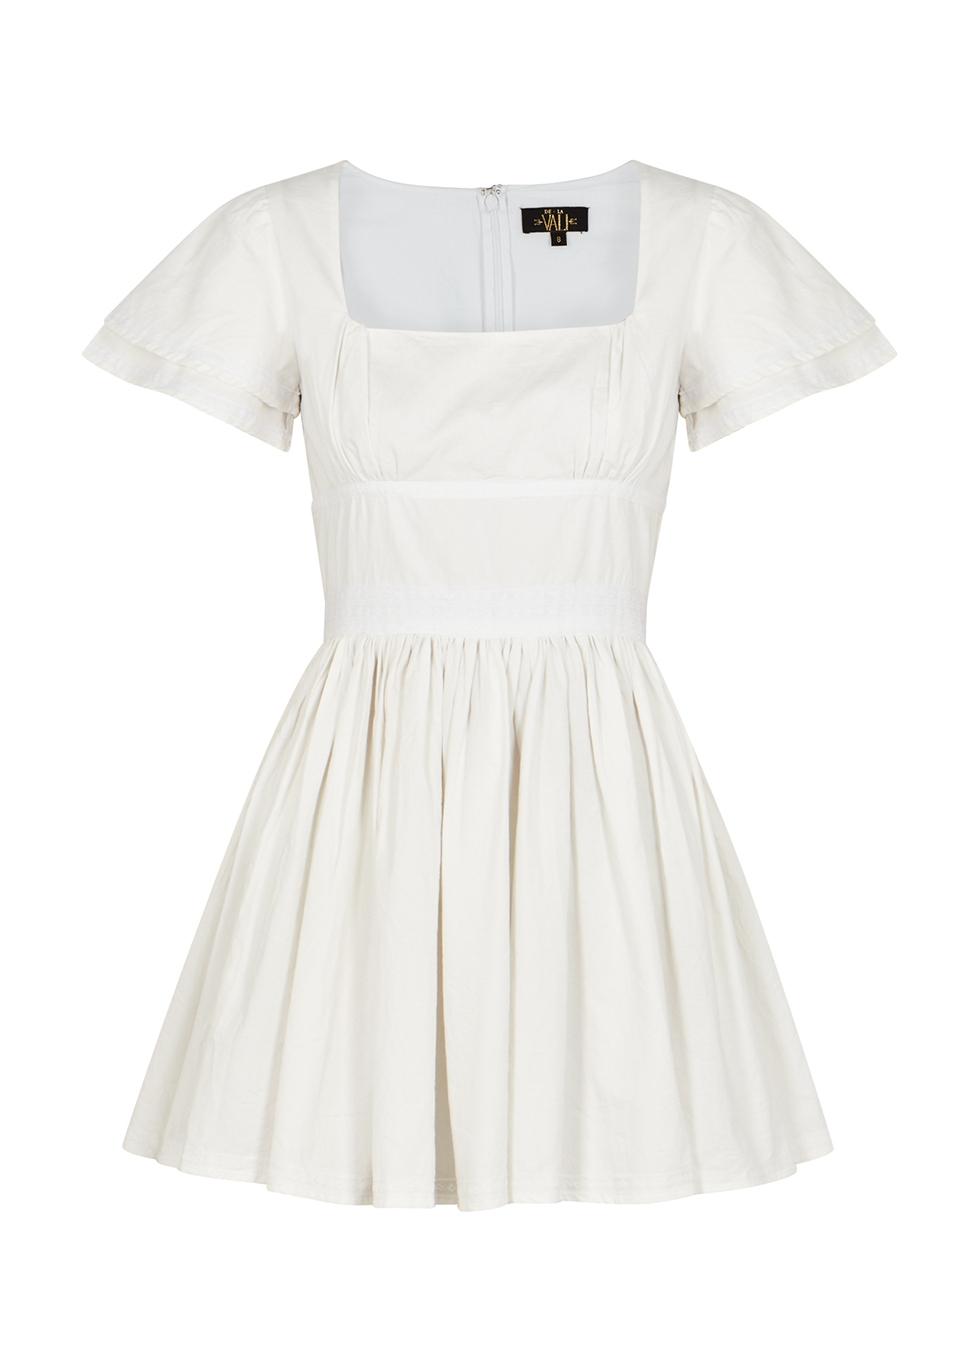 Chiquilla off-white cotton mini dress